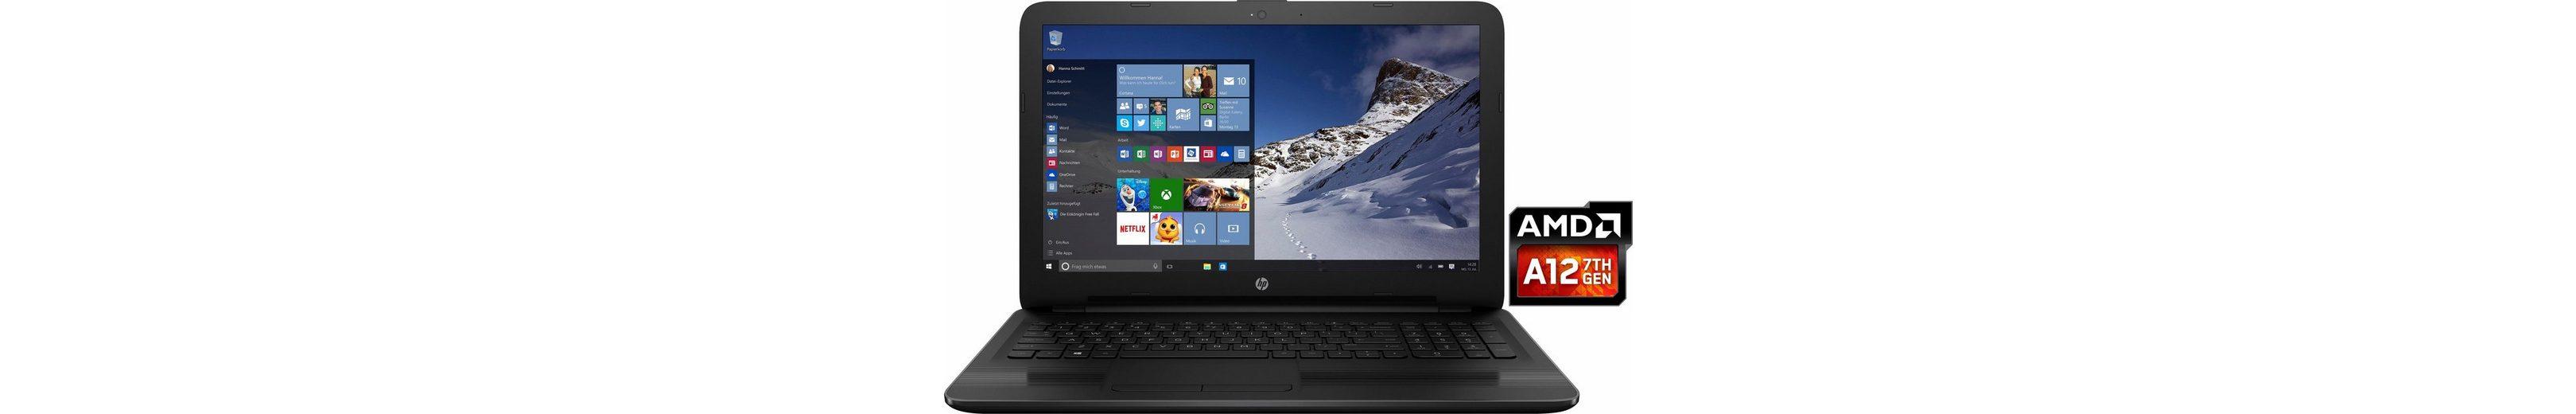 HP 15-ba066ng Notebook, AMD Quad Core, 39,6 cm (15,6 Zoll), 1000 GB Speicher, 8192 MB DDR4-SDRAM